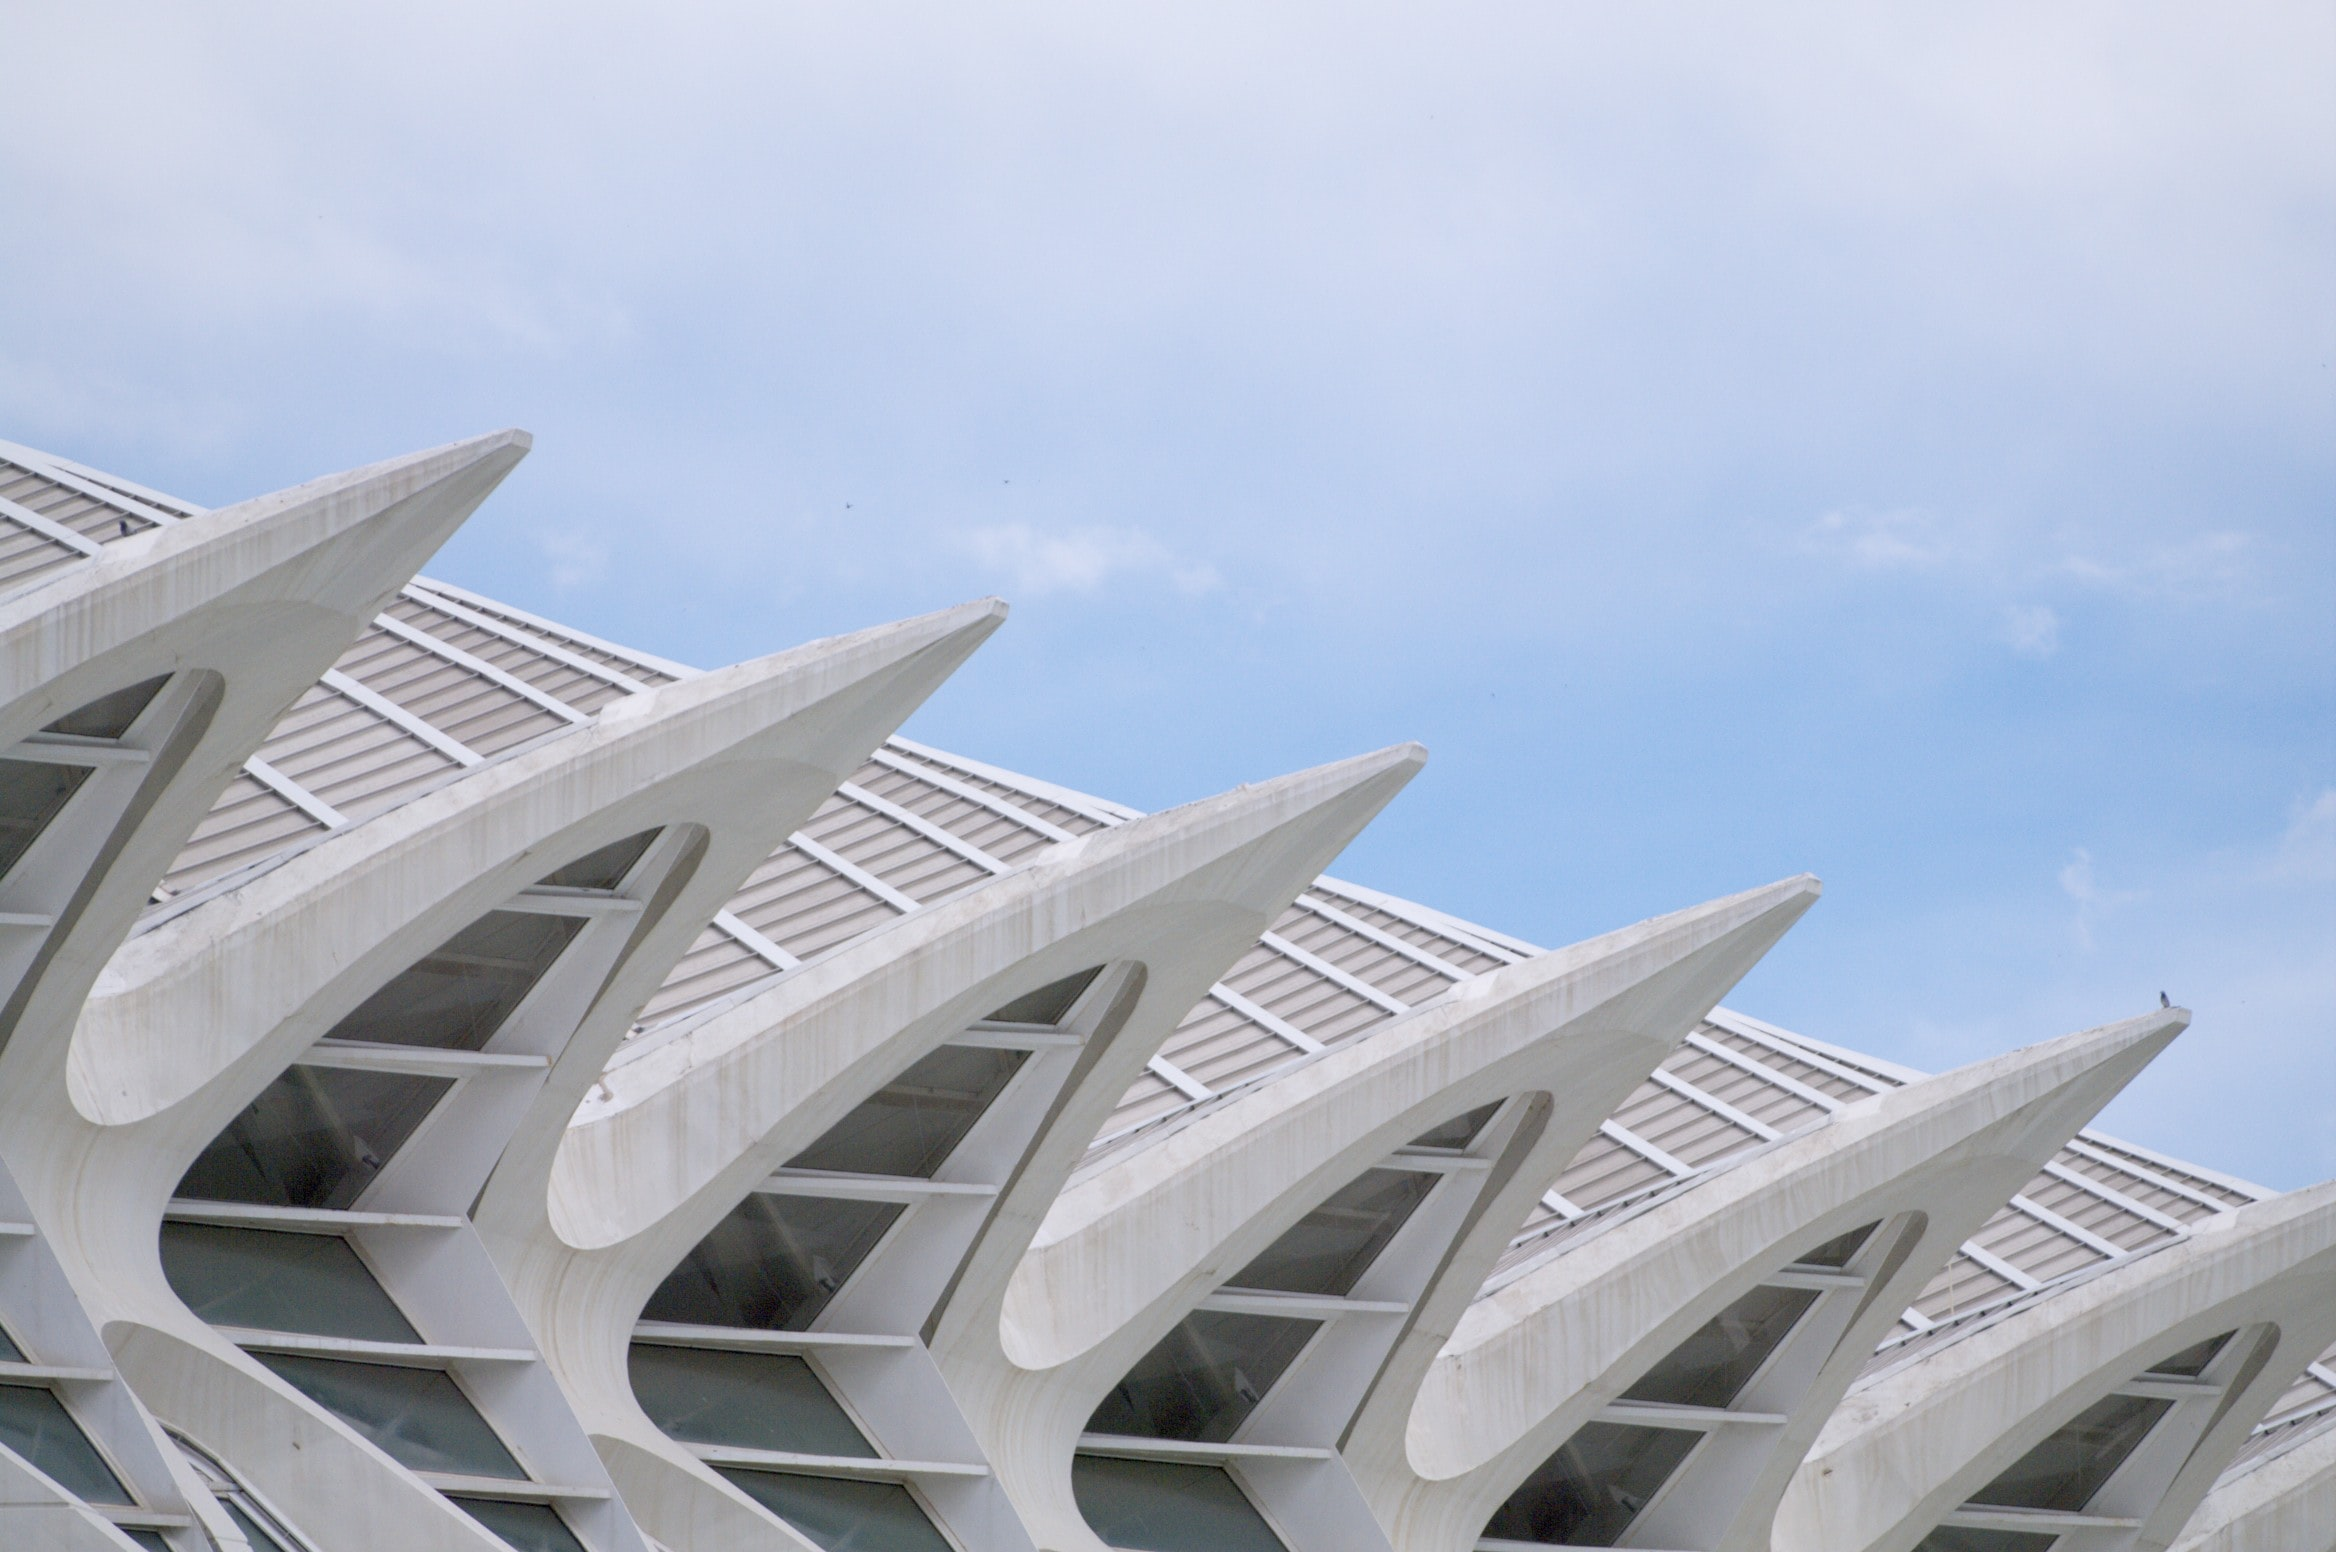 landscape of architectural building